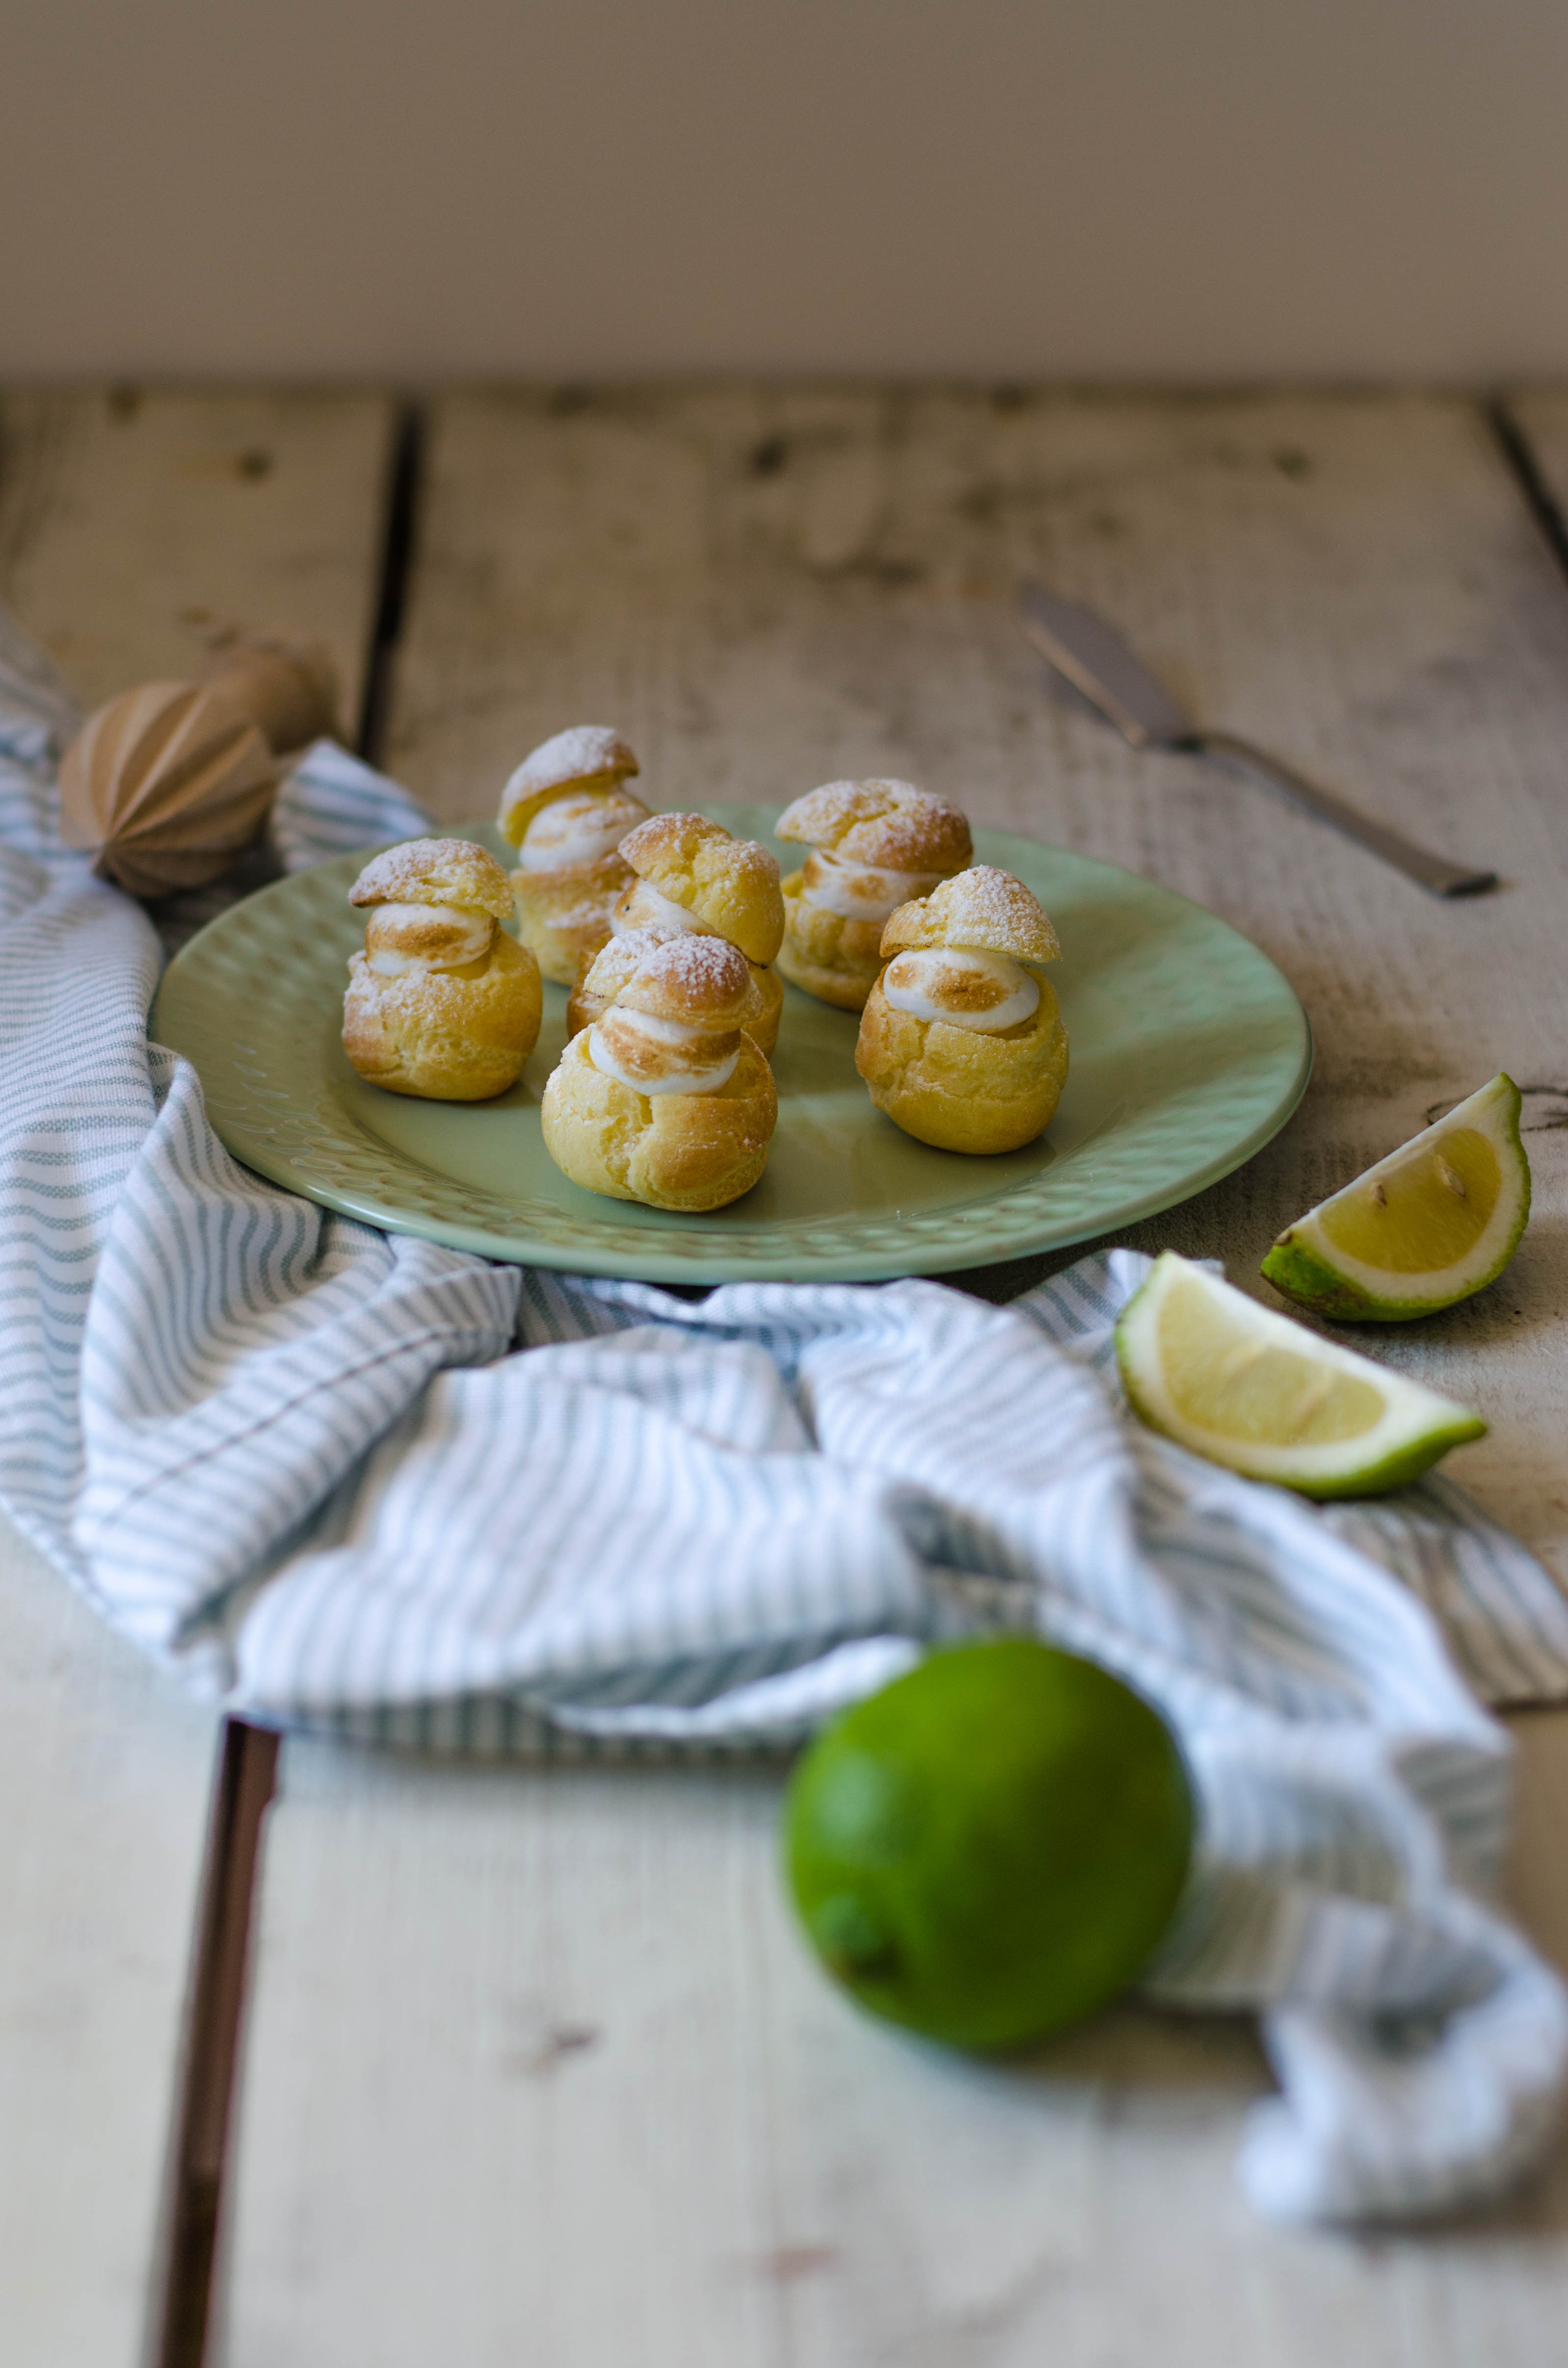 bigne_limone_meringa2 Bignè con crema al lime e meringa